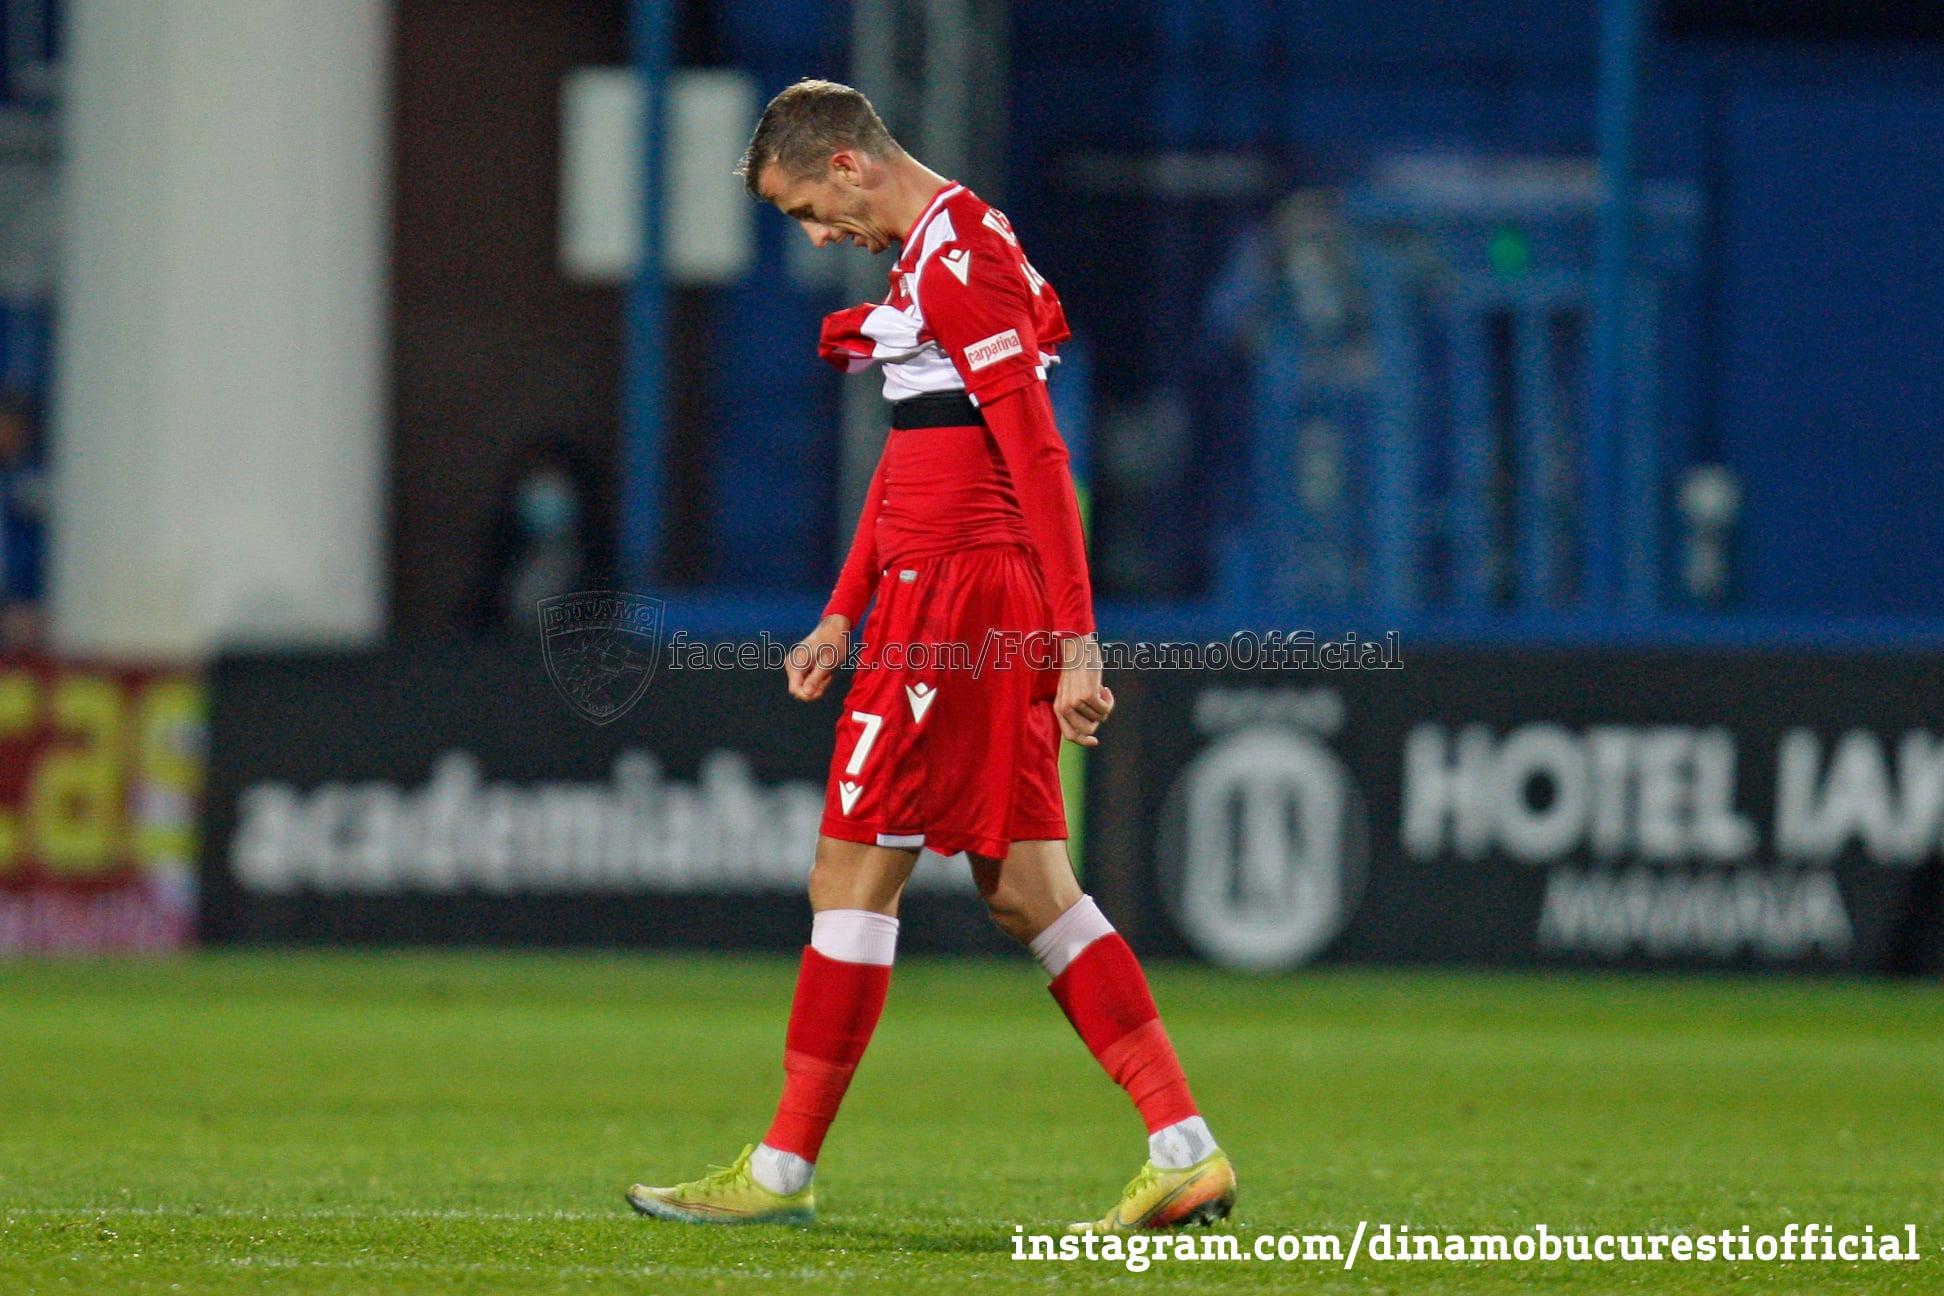 Dinamo Viitorul2